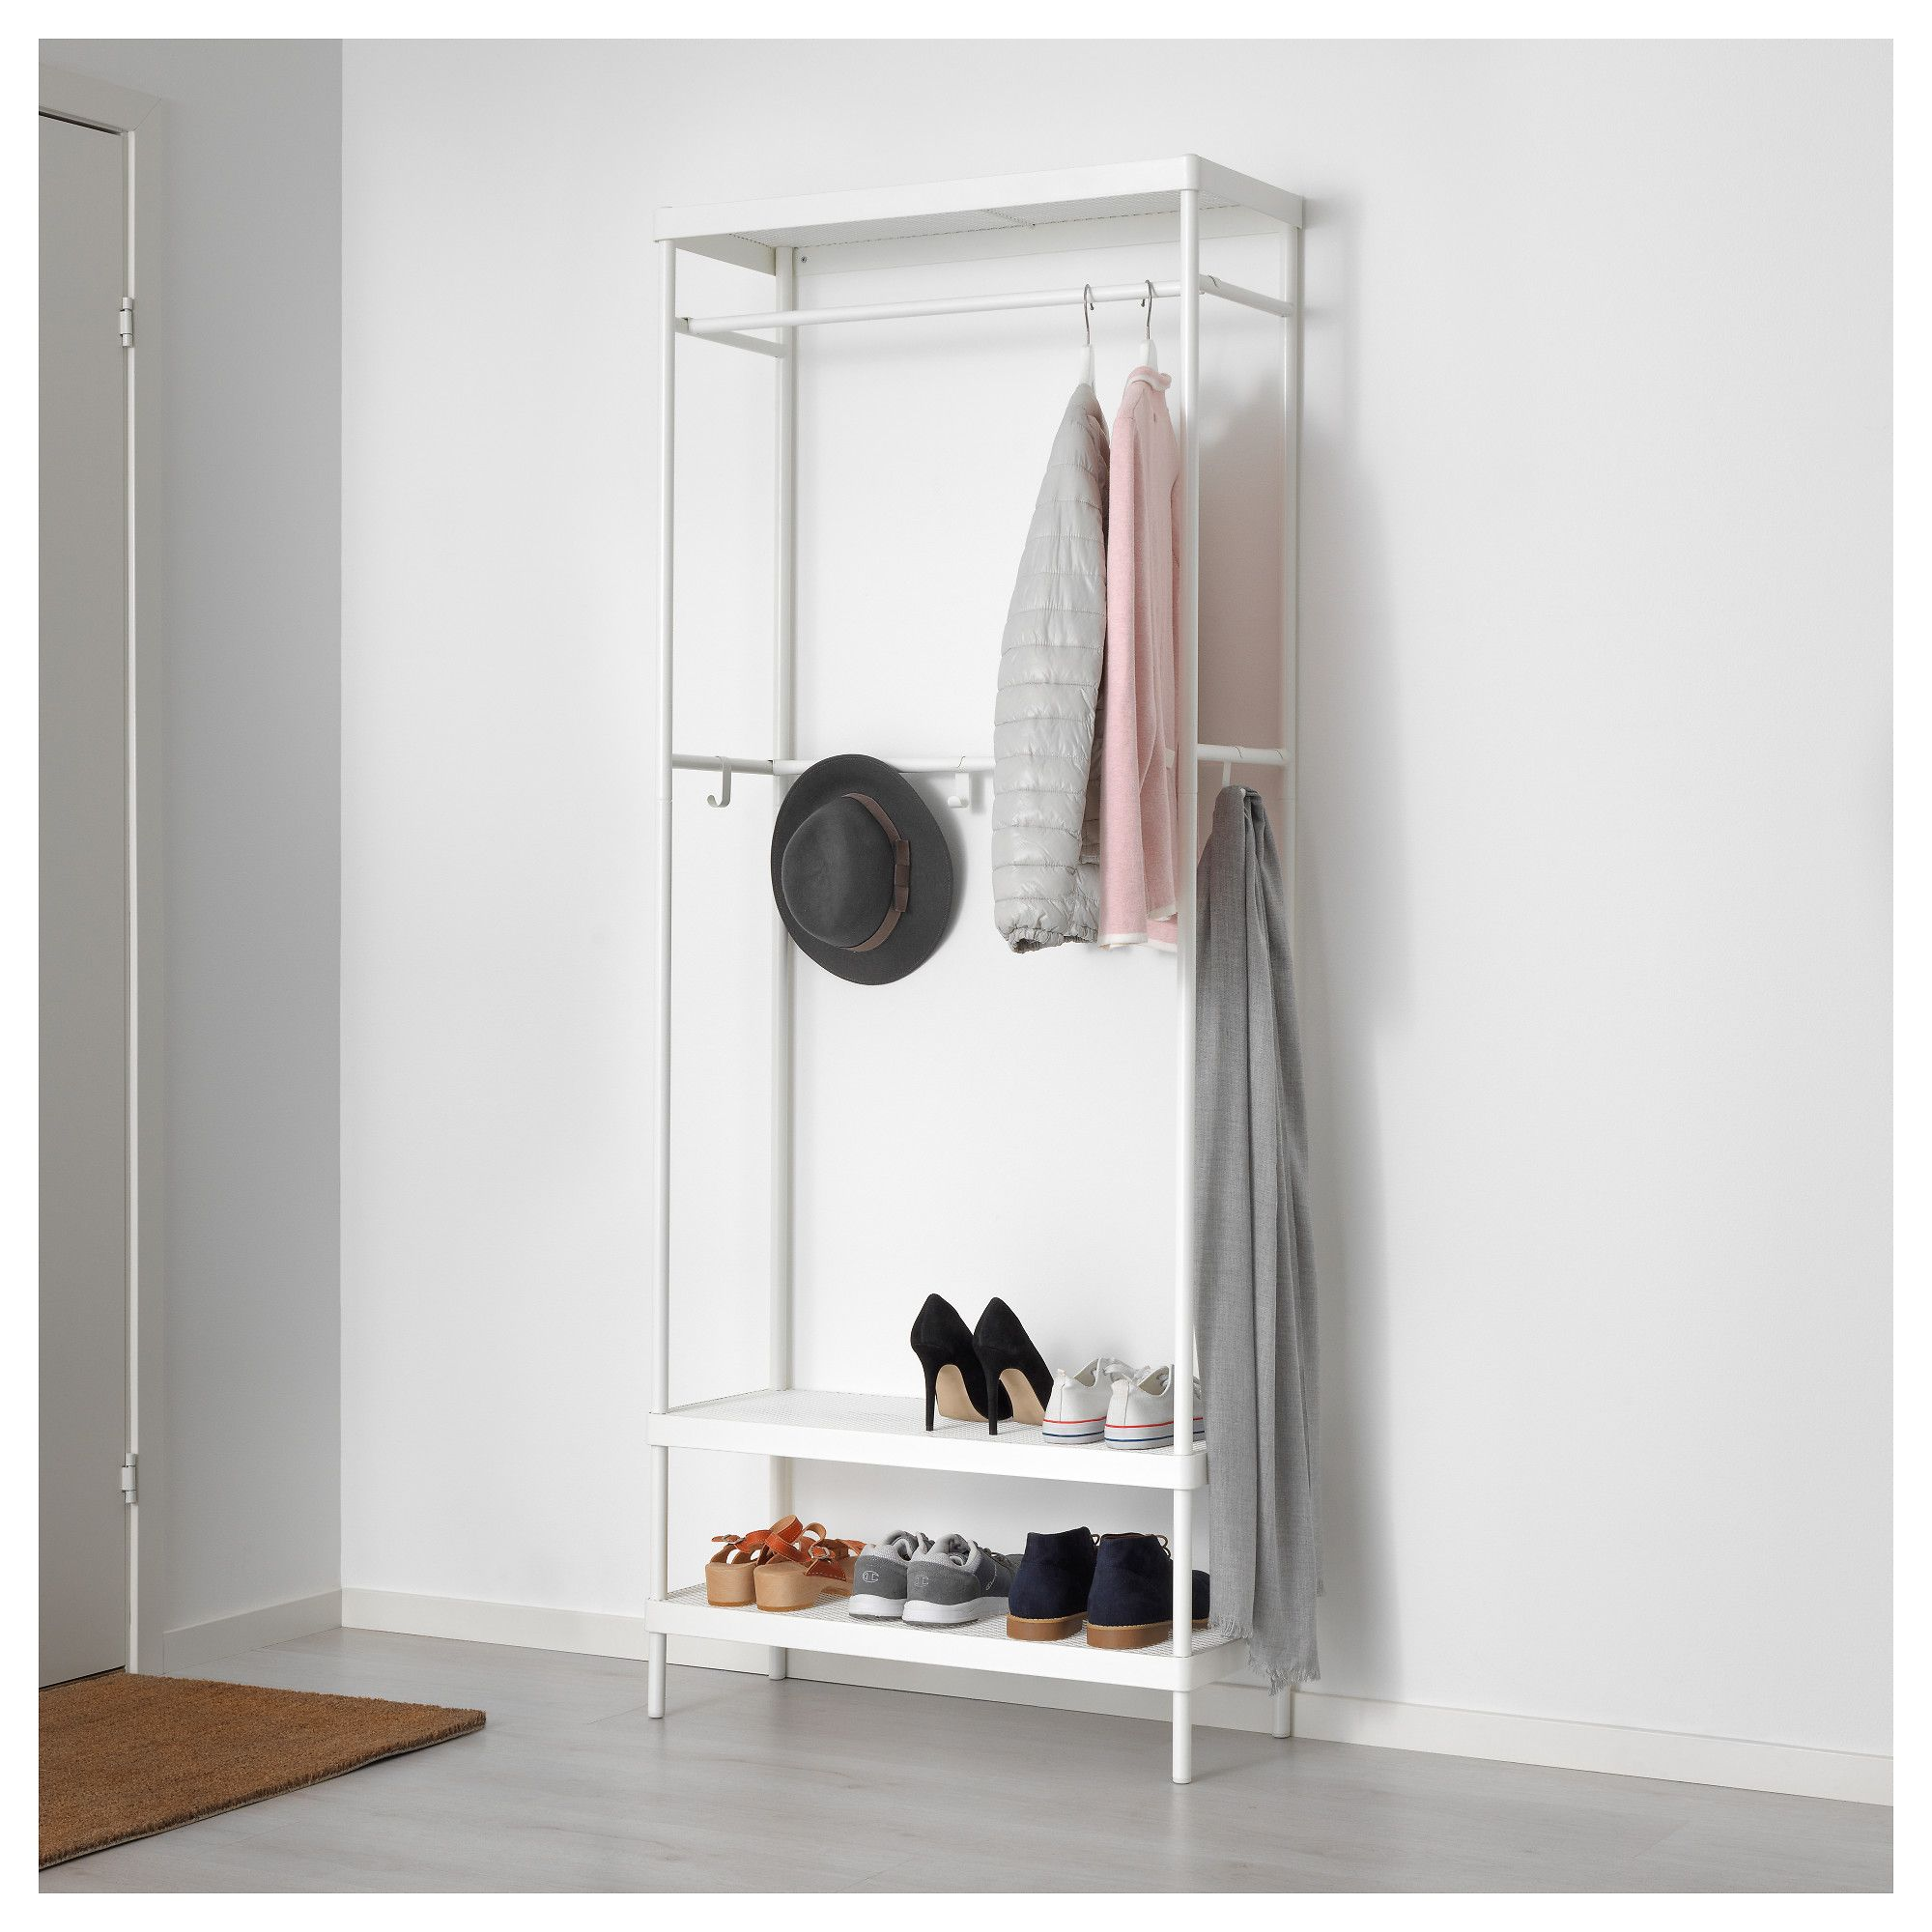 MACKAPÄR Coat rack with shoe storage unit 78 x 193 cm | Shoe storage ...